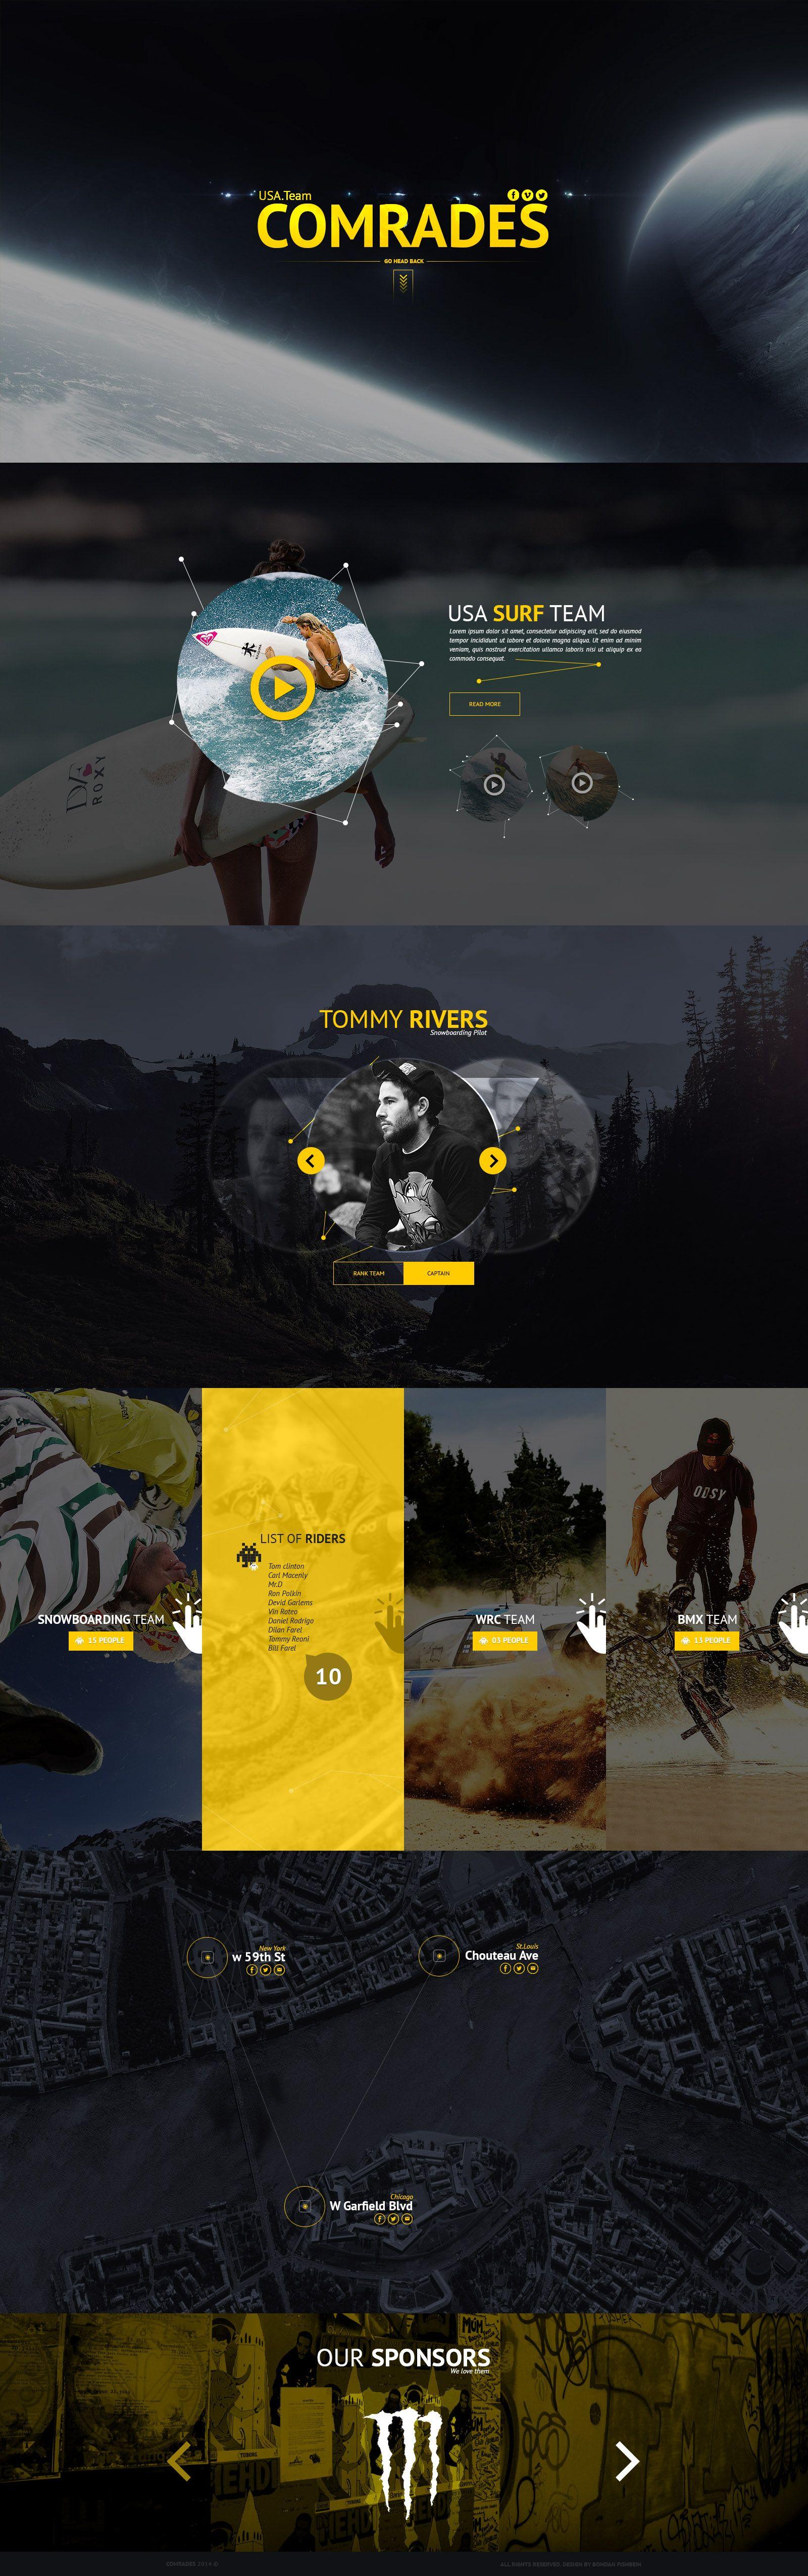 Landing Page - USA. Team Comrades by Shizoy.deviantart.com on @DeviantArt